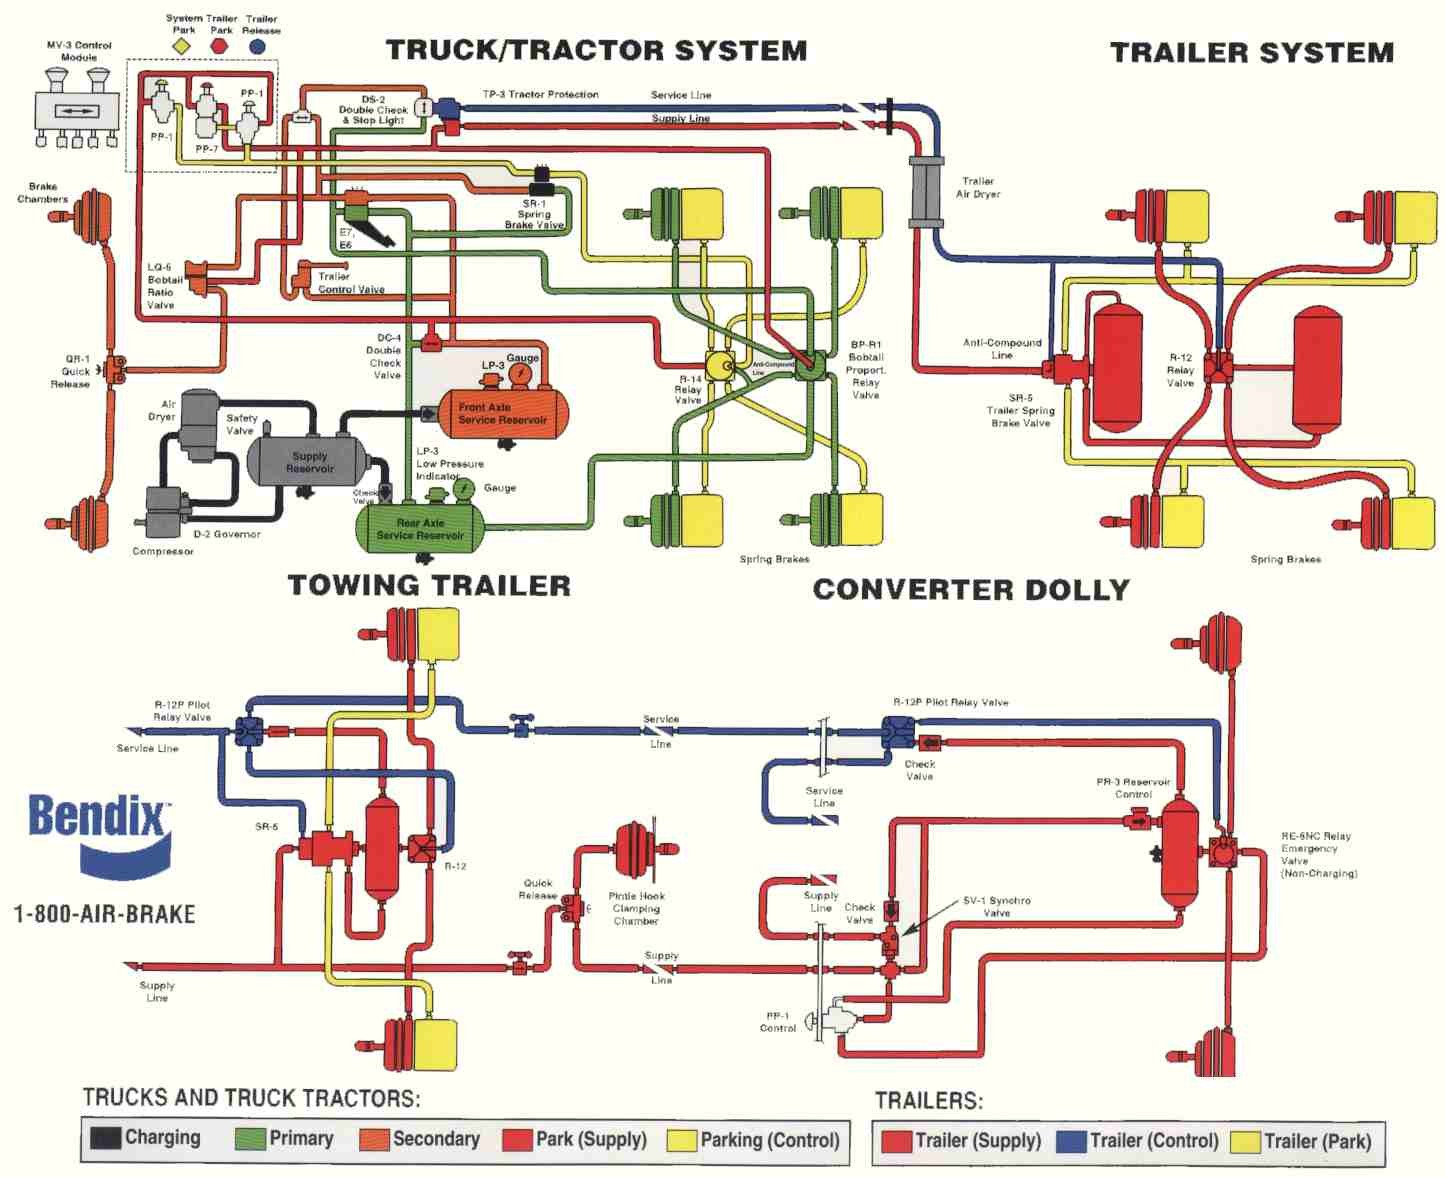 Truck Air Brake System Schematic Hnc Medium and Heavy Duty Truck Parts Line Of Truck Air Brake System Schematic